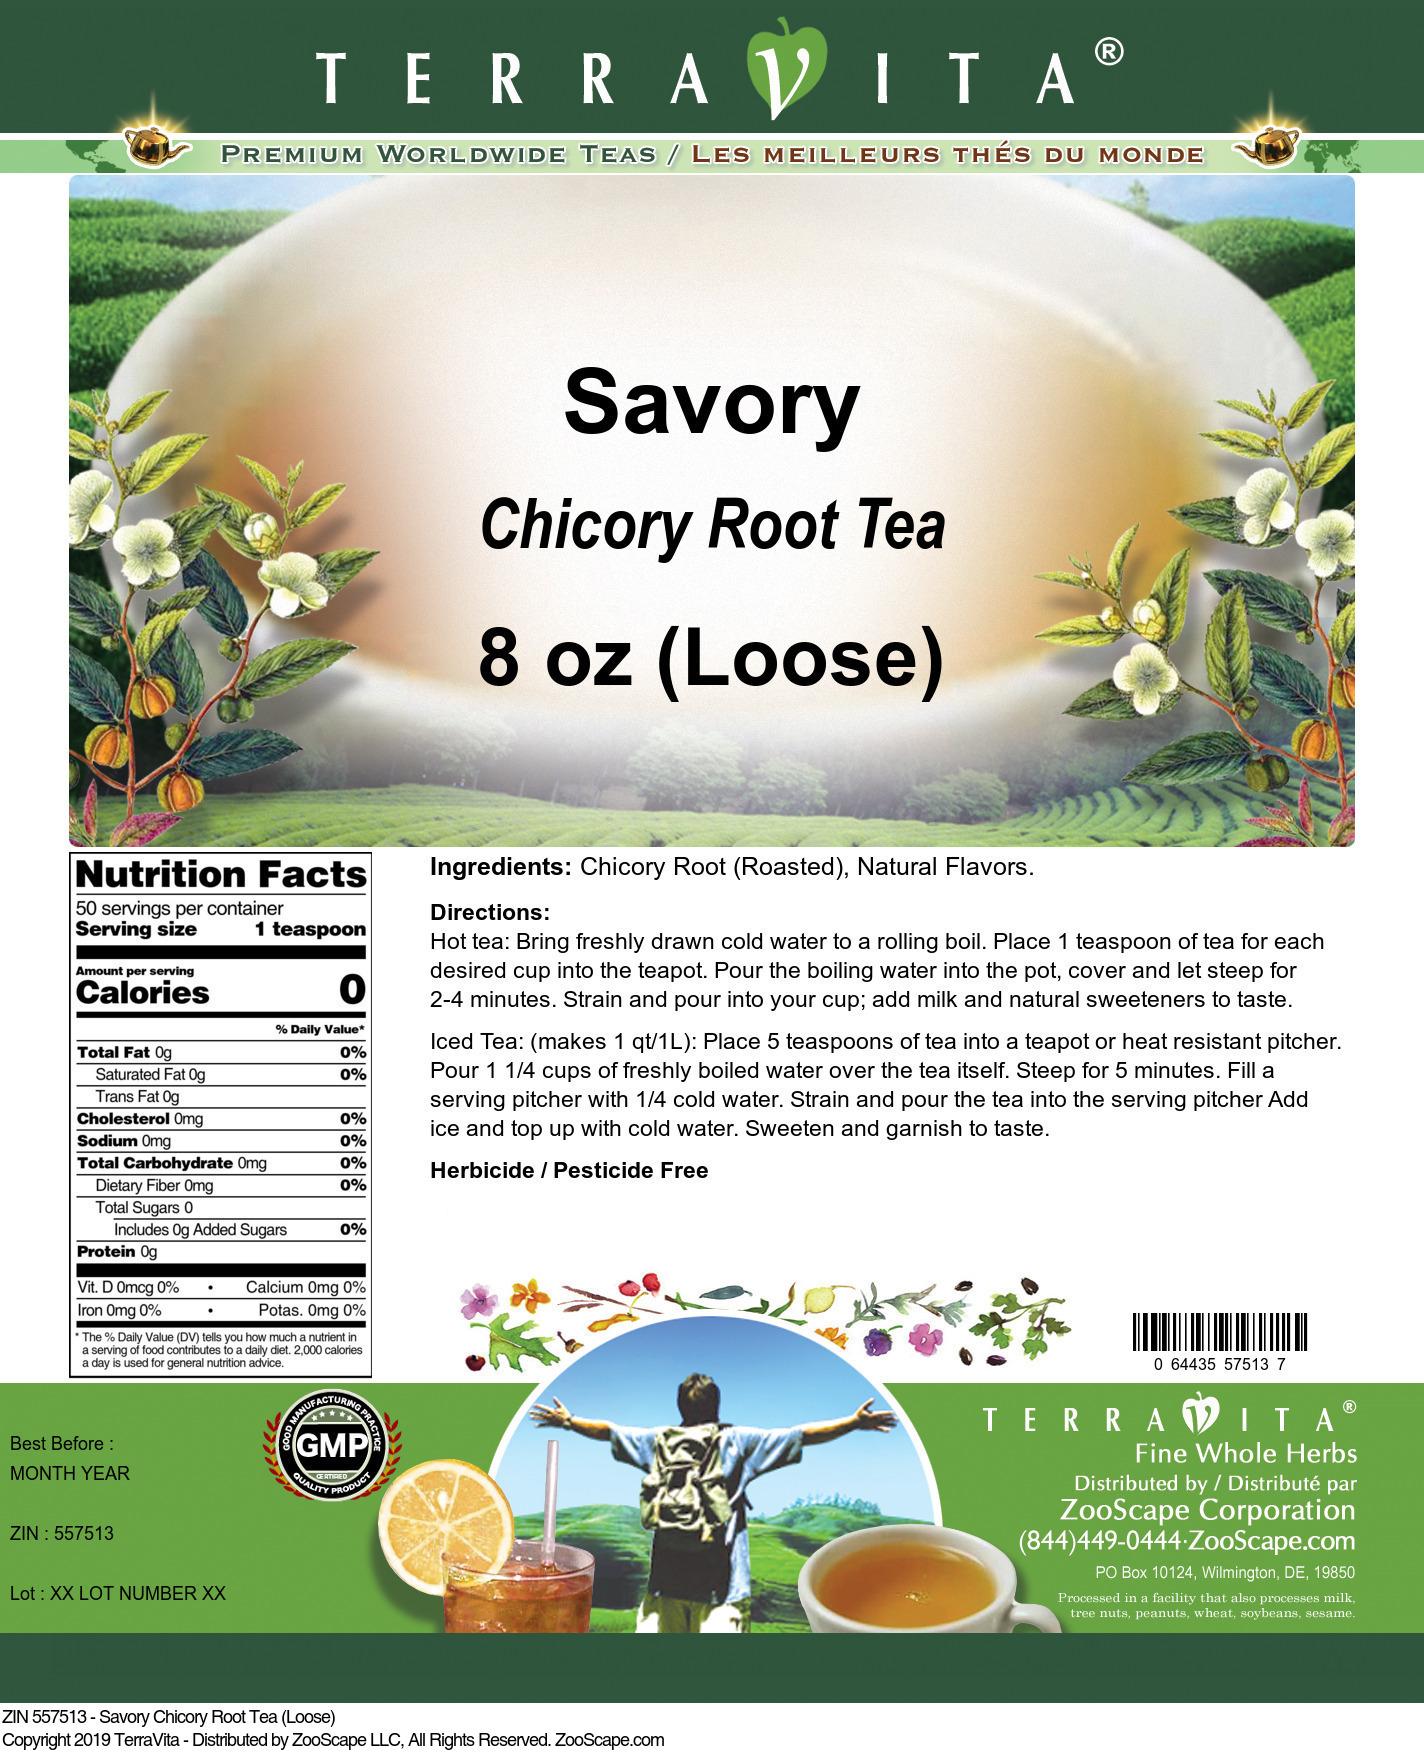 Savory Chicory Root Tea (Loose)